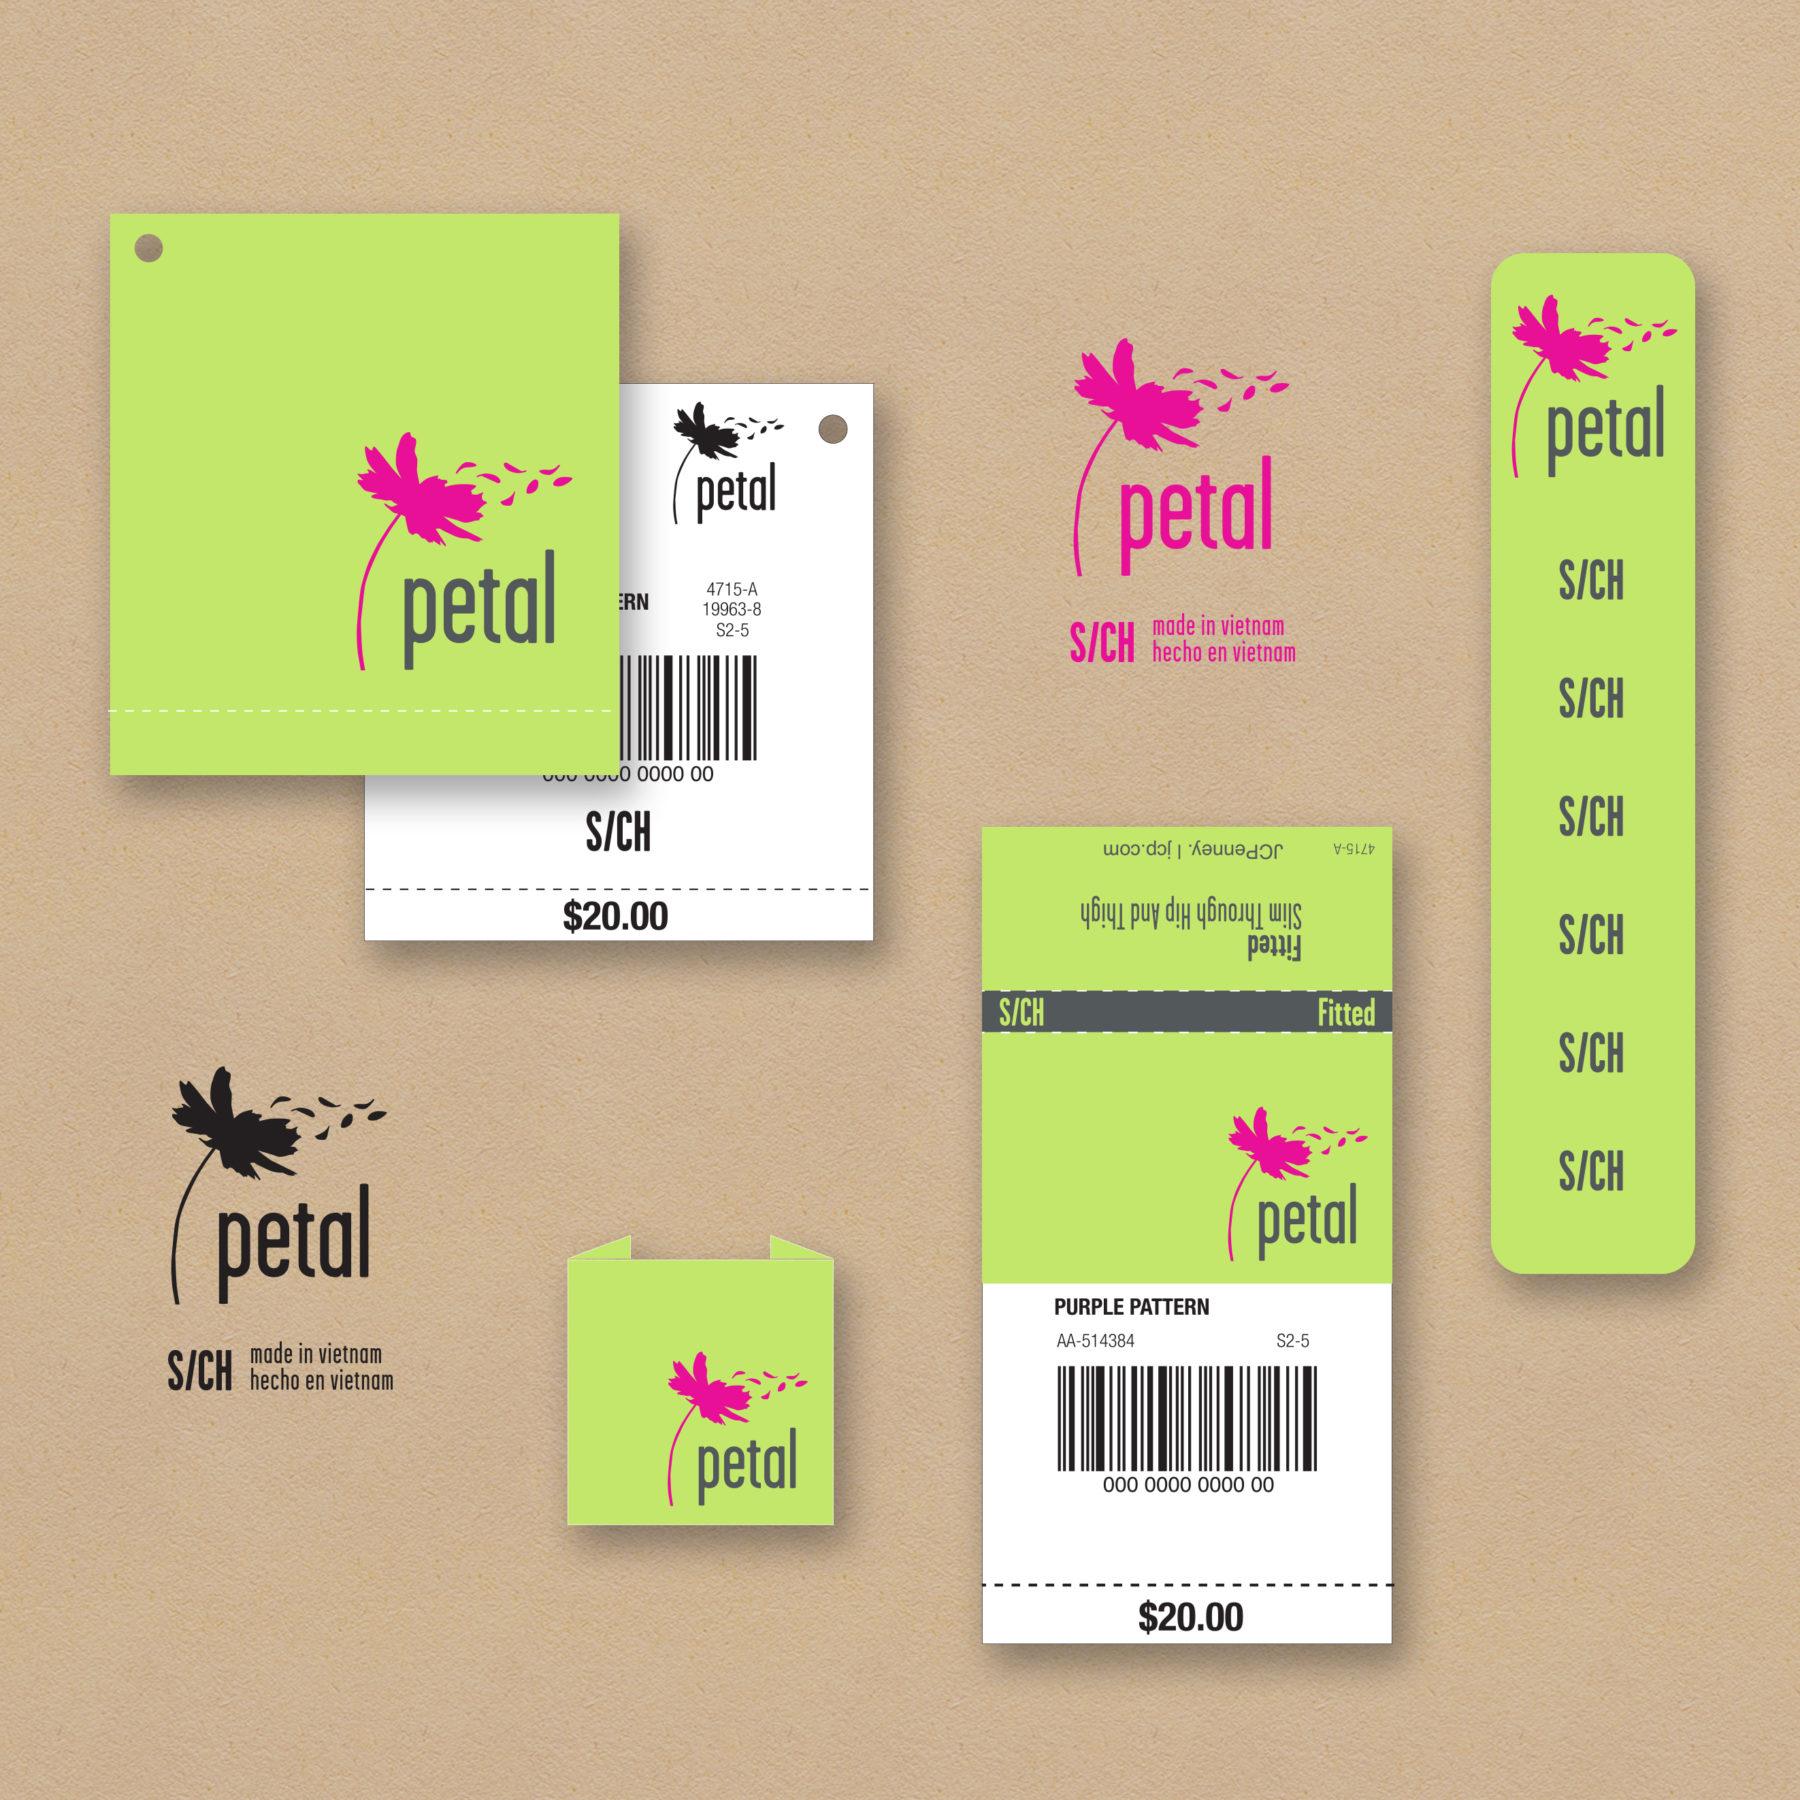 Petal Apparel branding